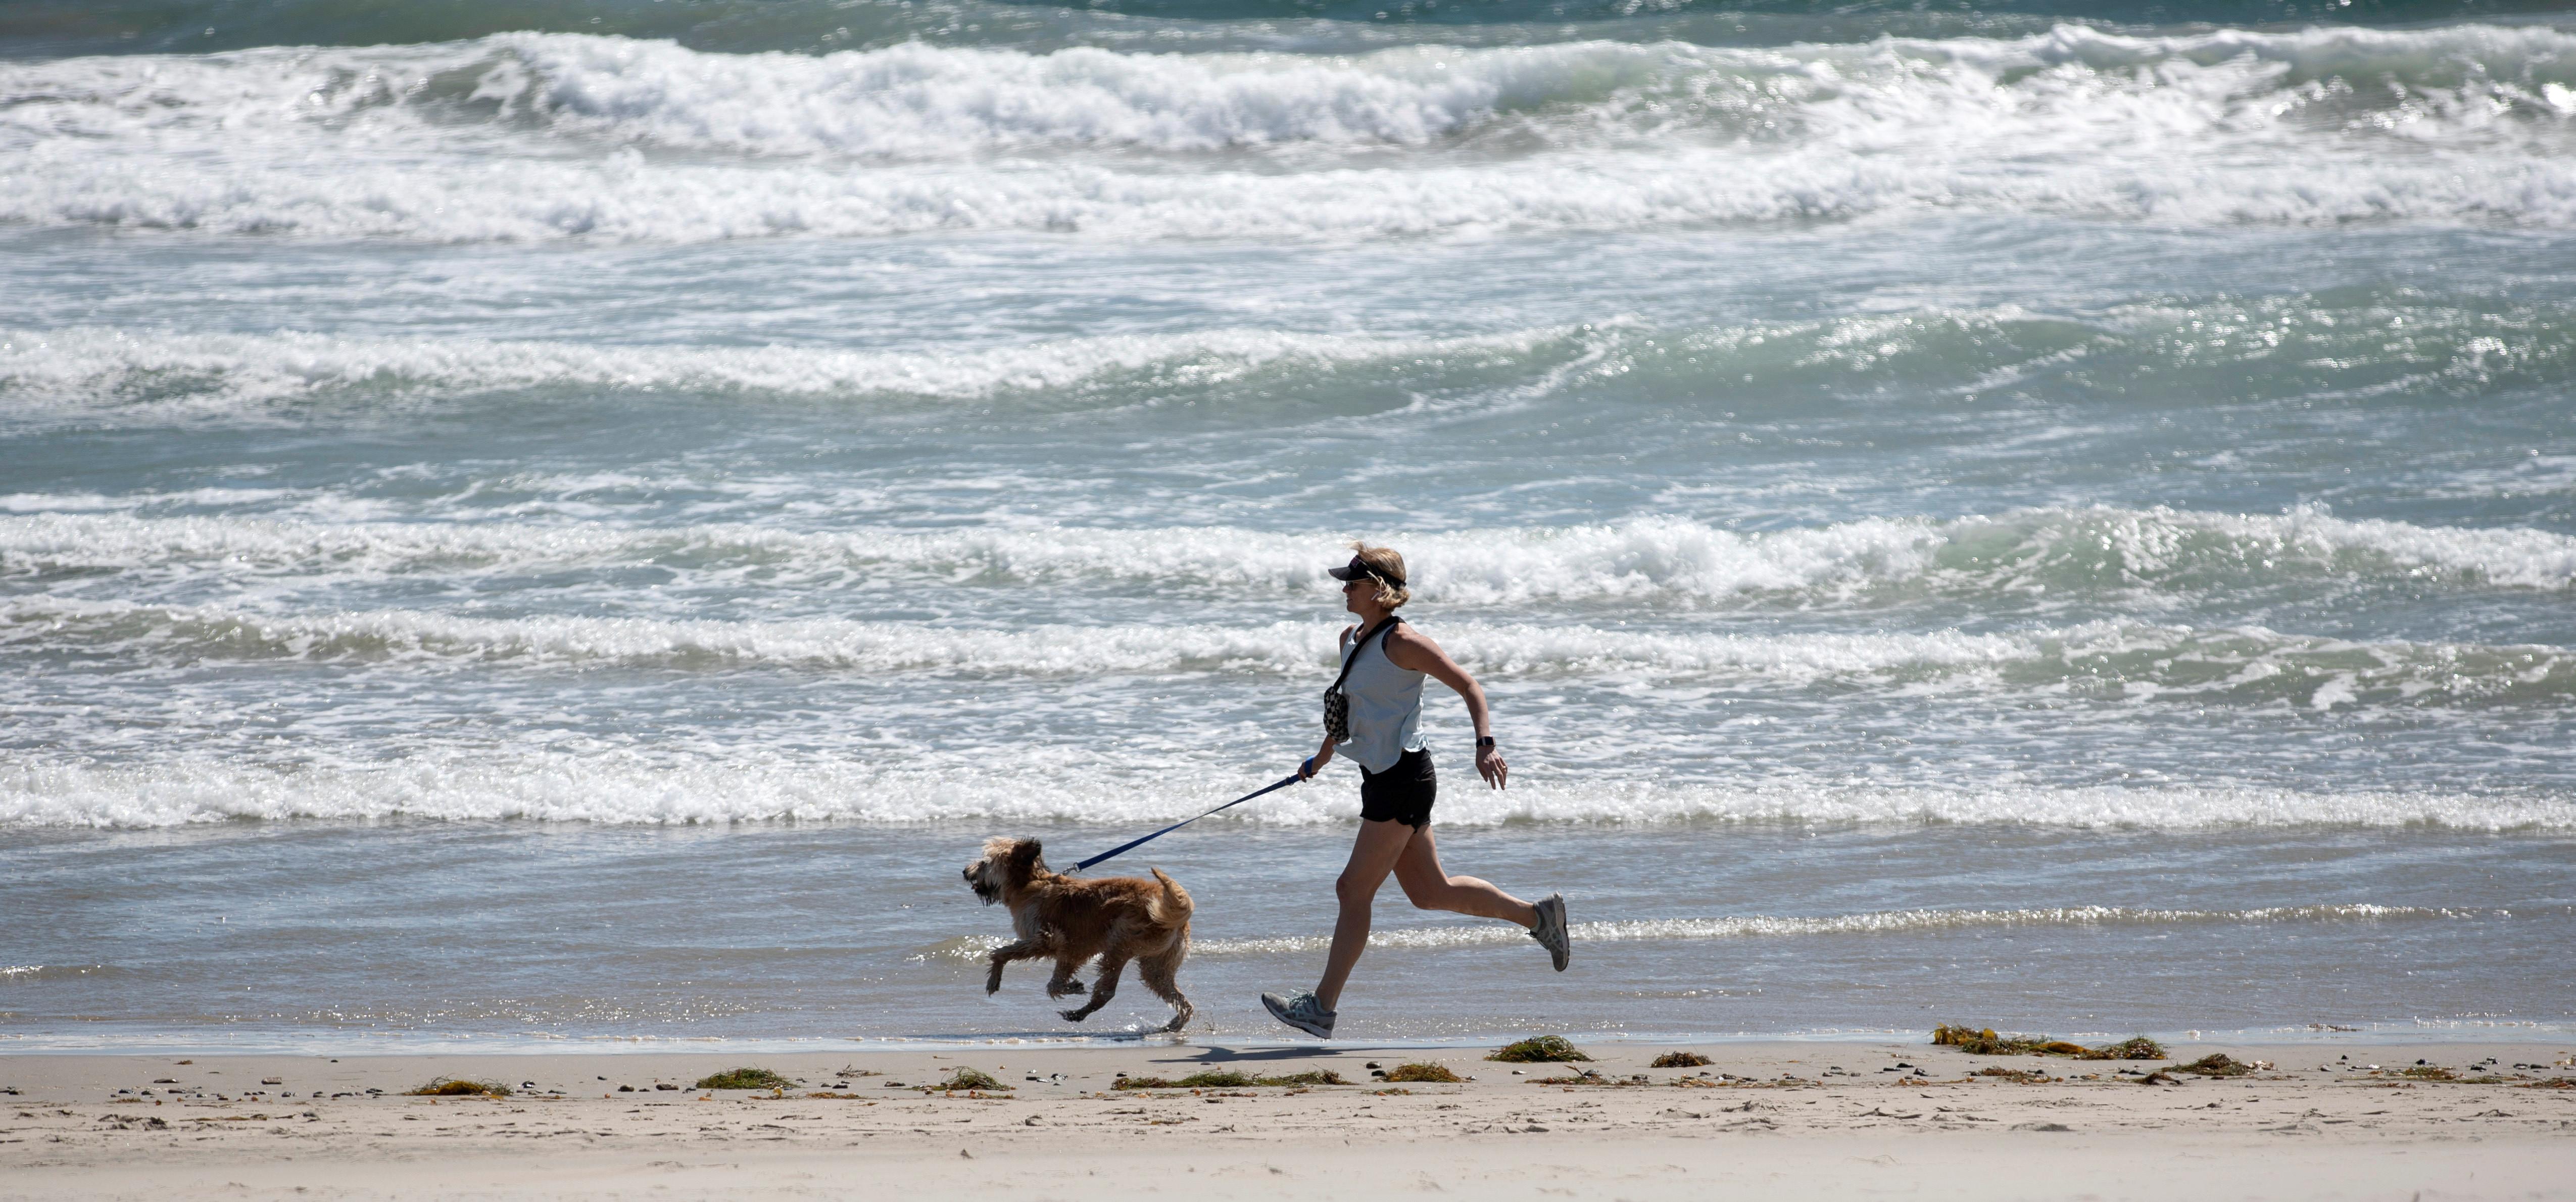 A woman jogs with her dog on Zuma Beach during the outbreak of the coronavirus disease (COVID-19) in Malibu, California